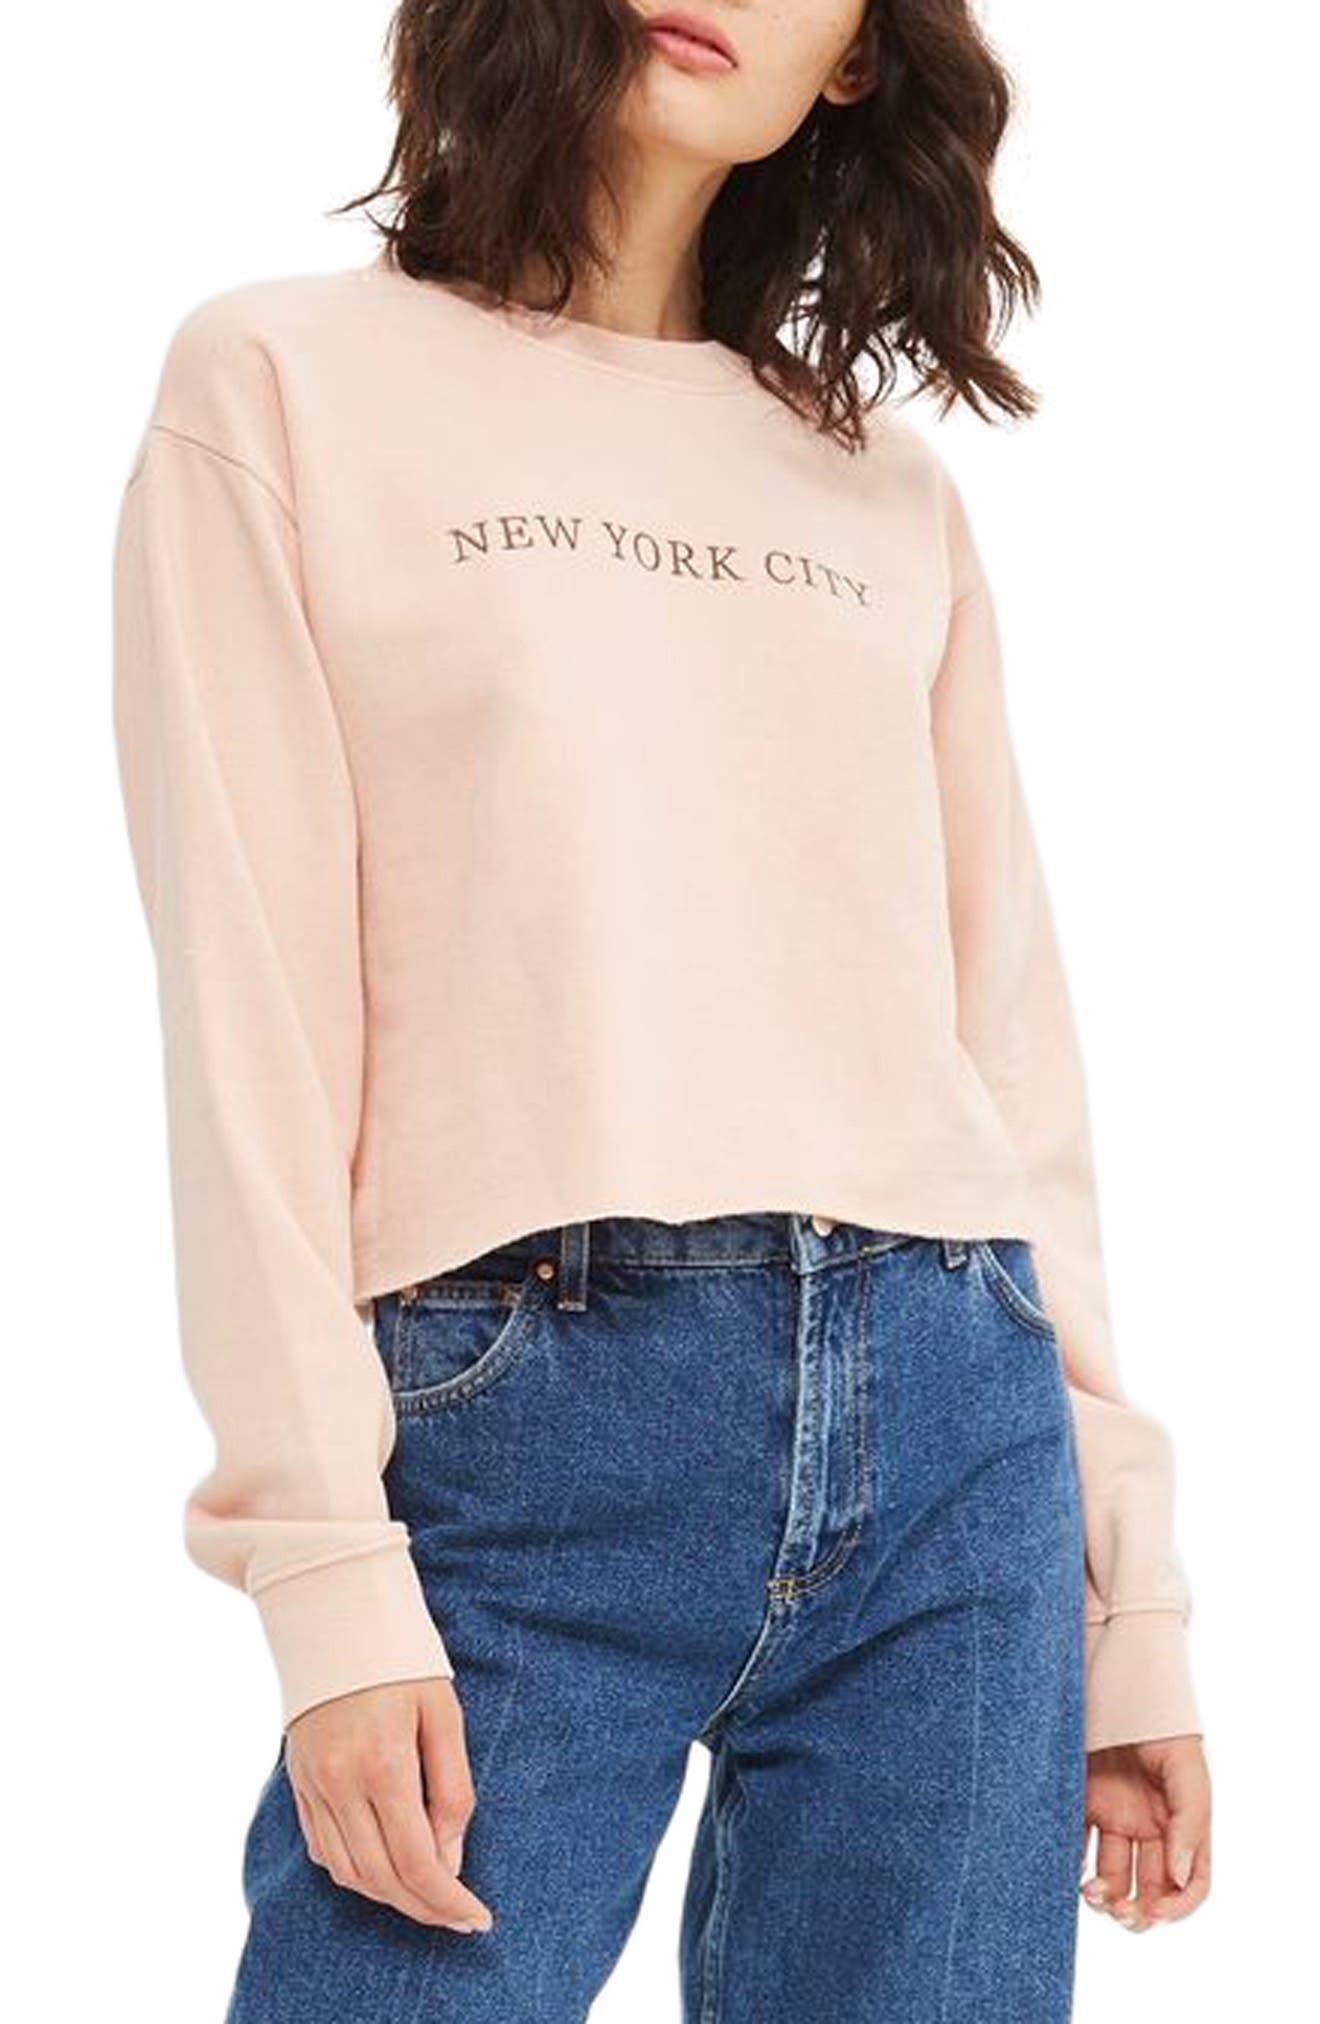 Topshop New York City Embroidered Sweatshirt